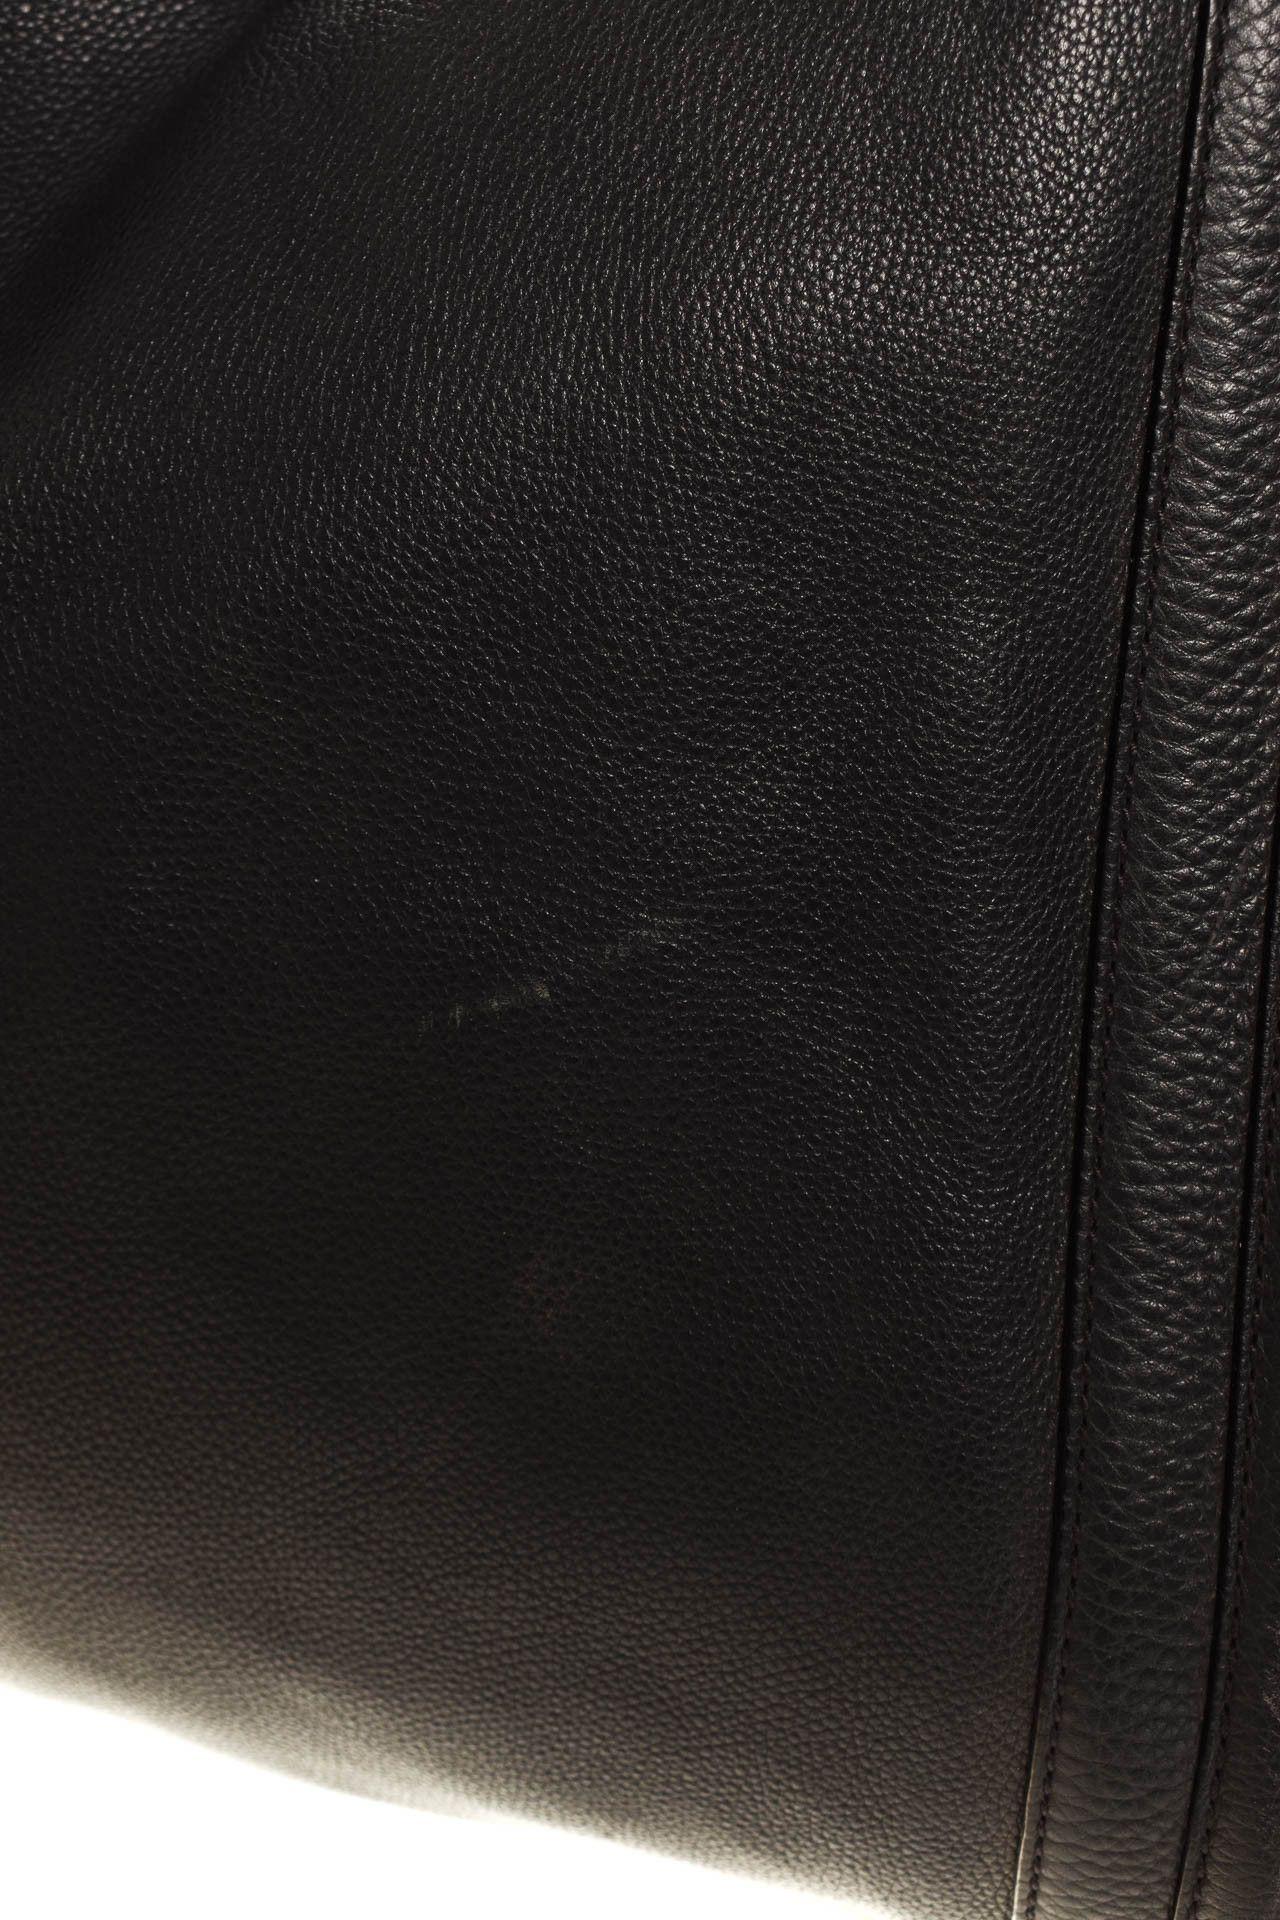 Gucci - Hand Bag Grafite - Foto 7